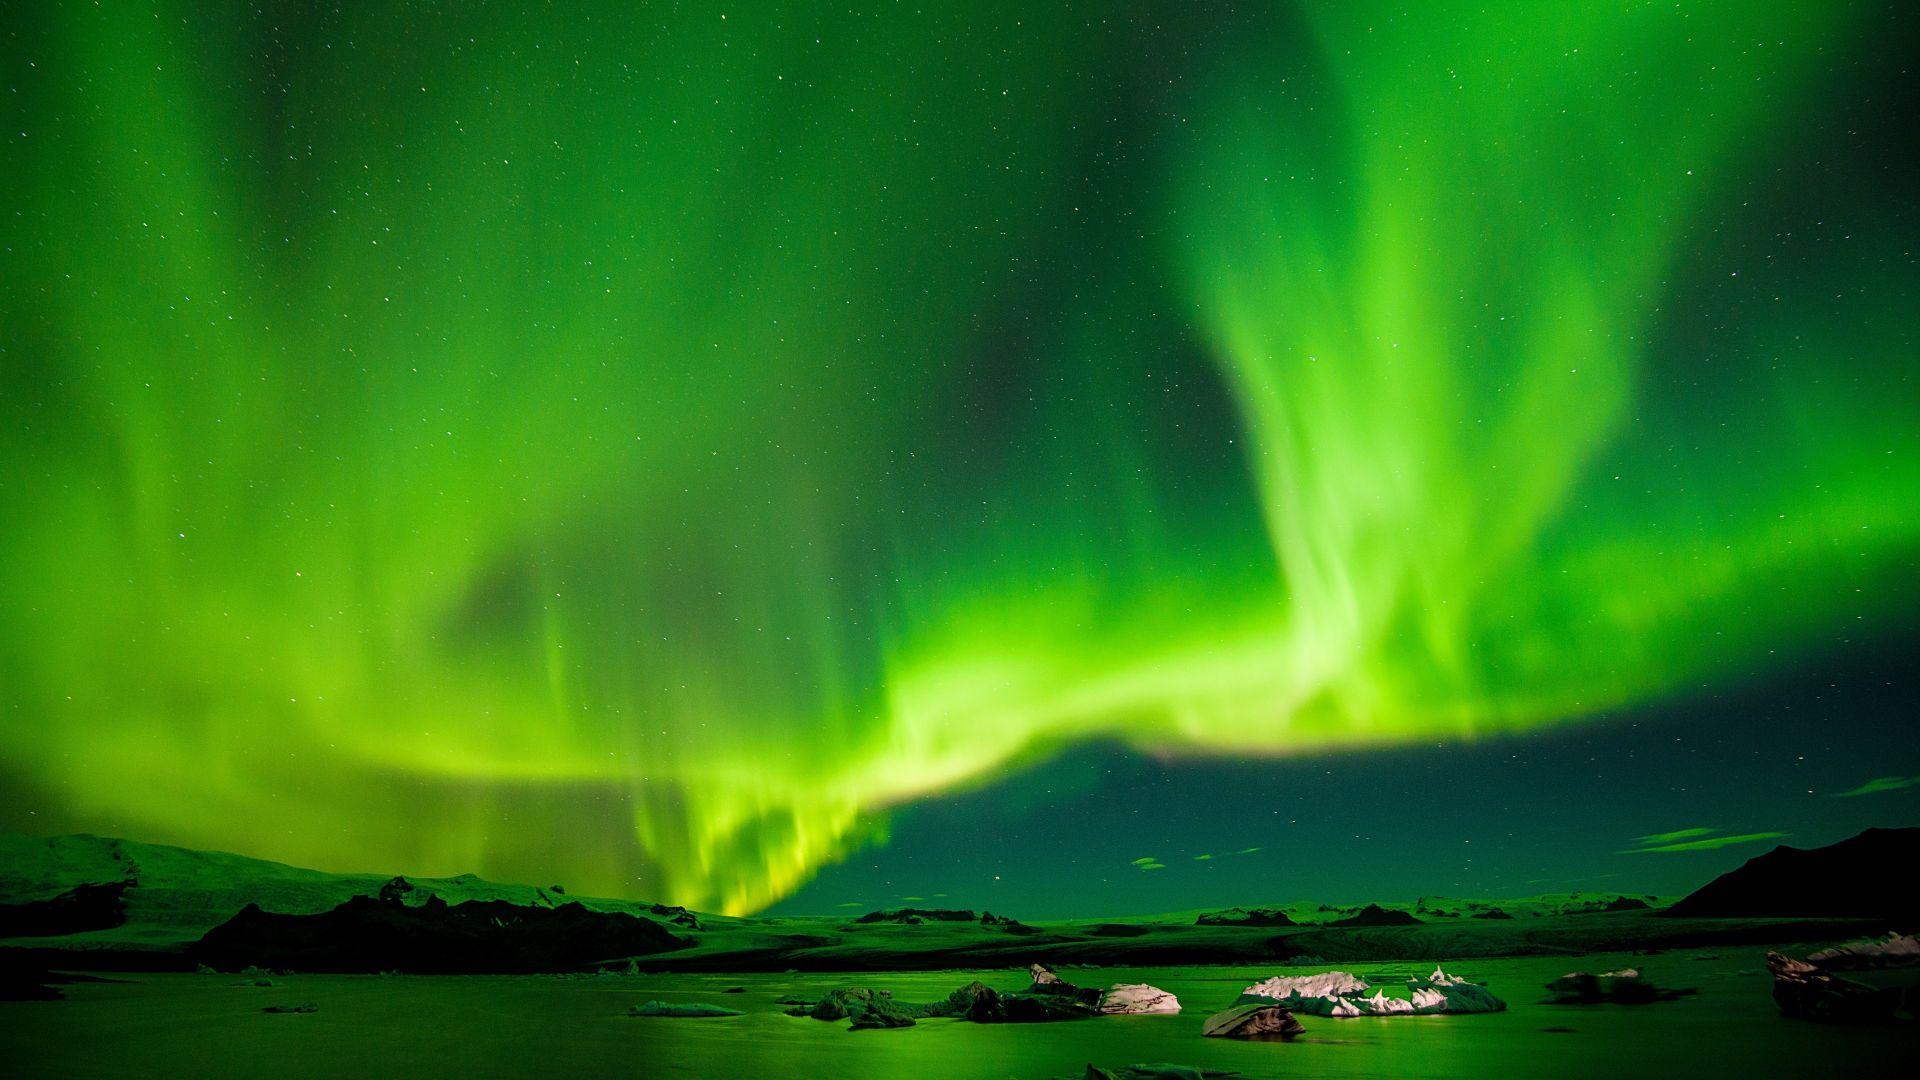 Desktop Wallpaper Aurora Borealis In Iceland Hd Image Picture